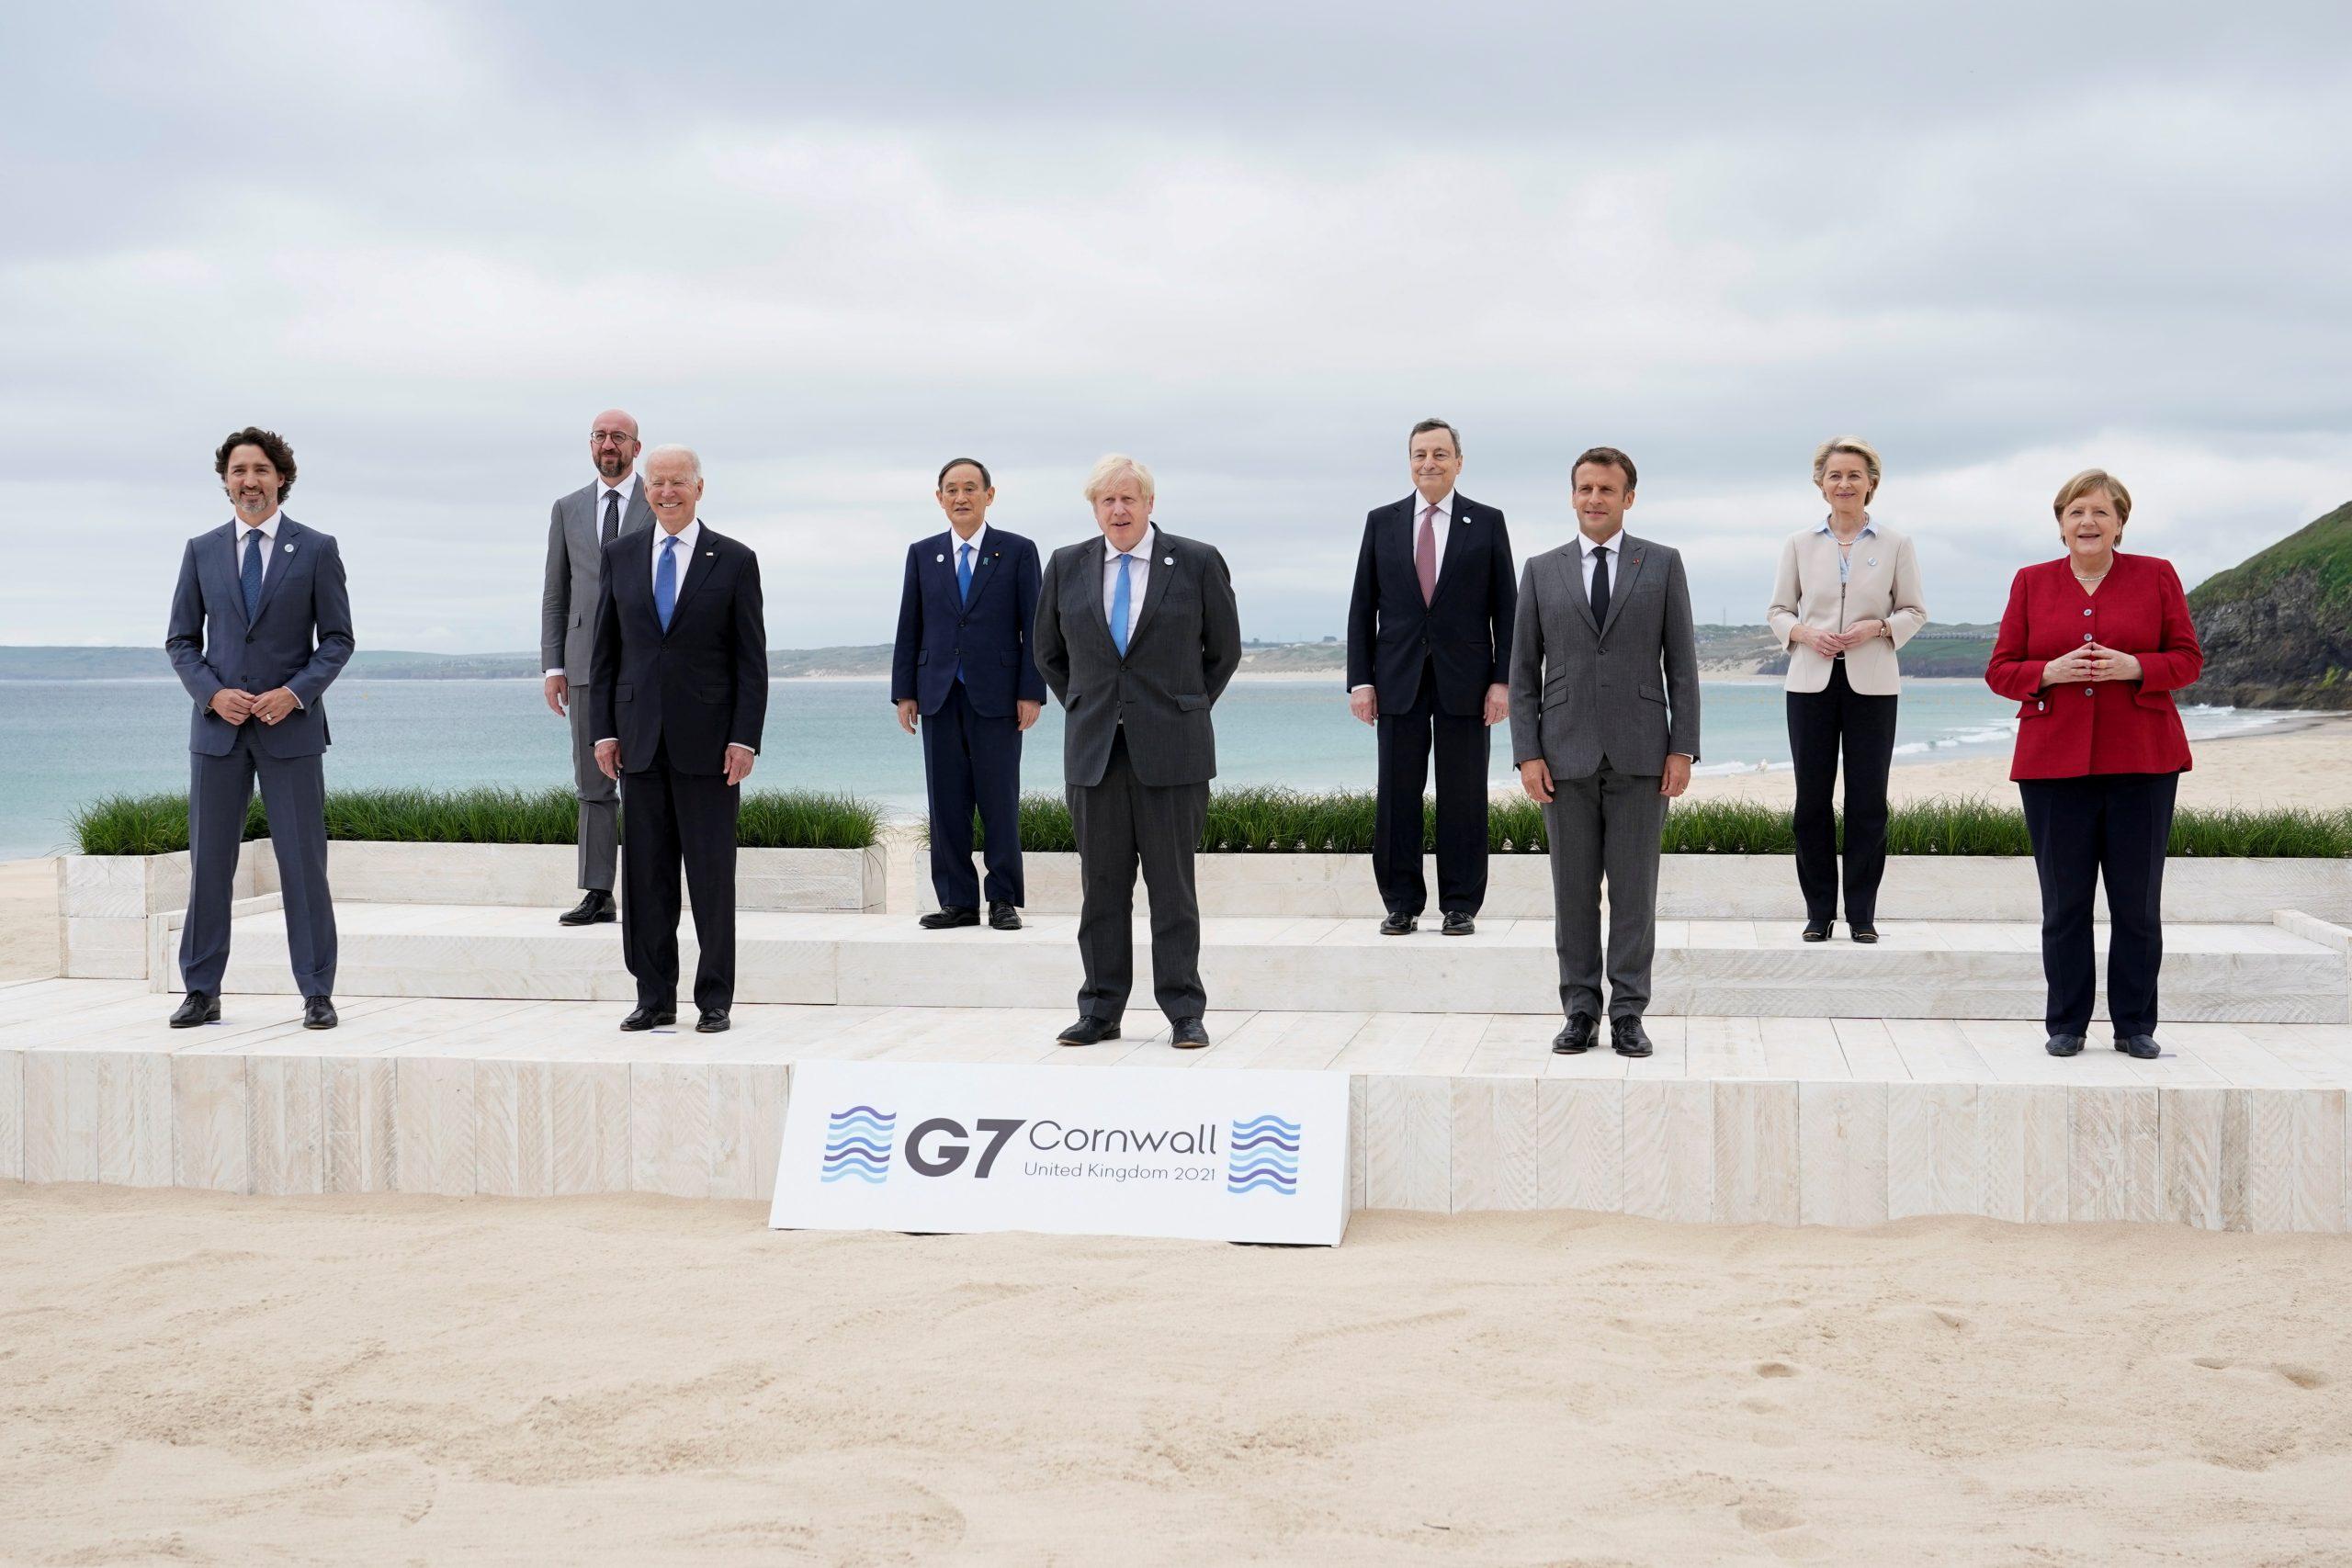 Els líders del G7 Justin Trudeau, Joe Biden, Yoshihide Suga, Boris Johnson, Mario Draghi, Emmanuel Macron i Angela Merkel amb Ursula von der Leyen i Charles Michel, a Carbis Bay, Regne Unit | ACN